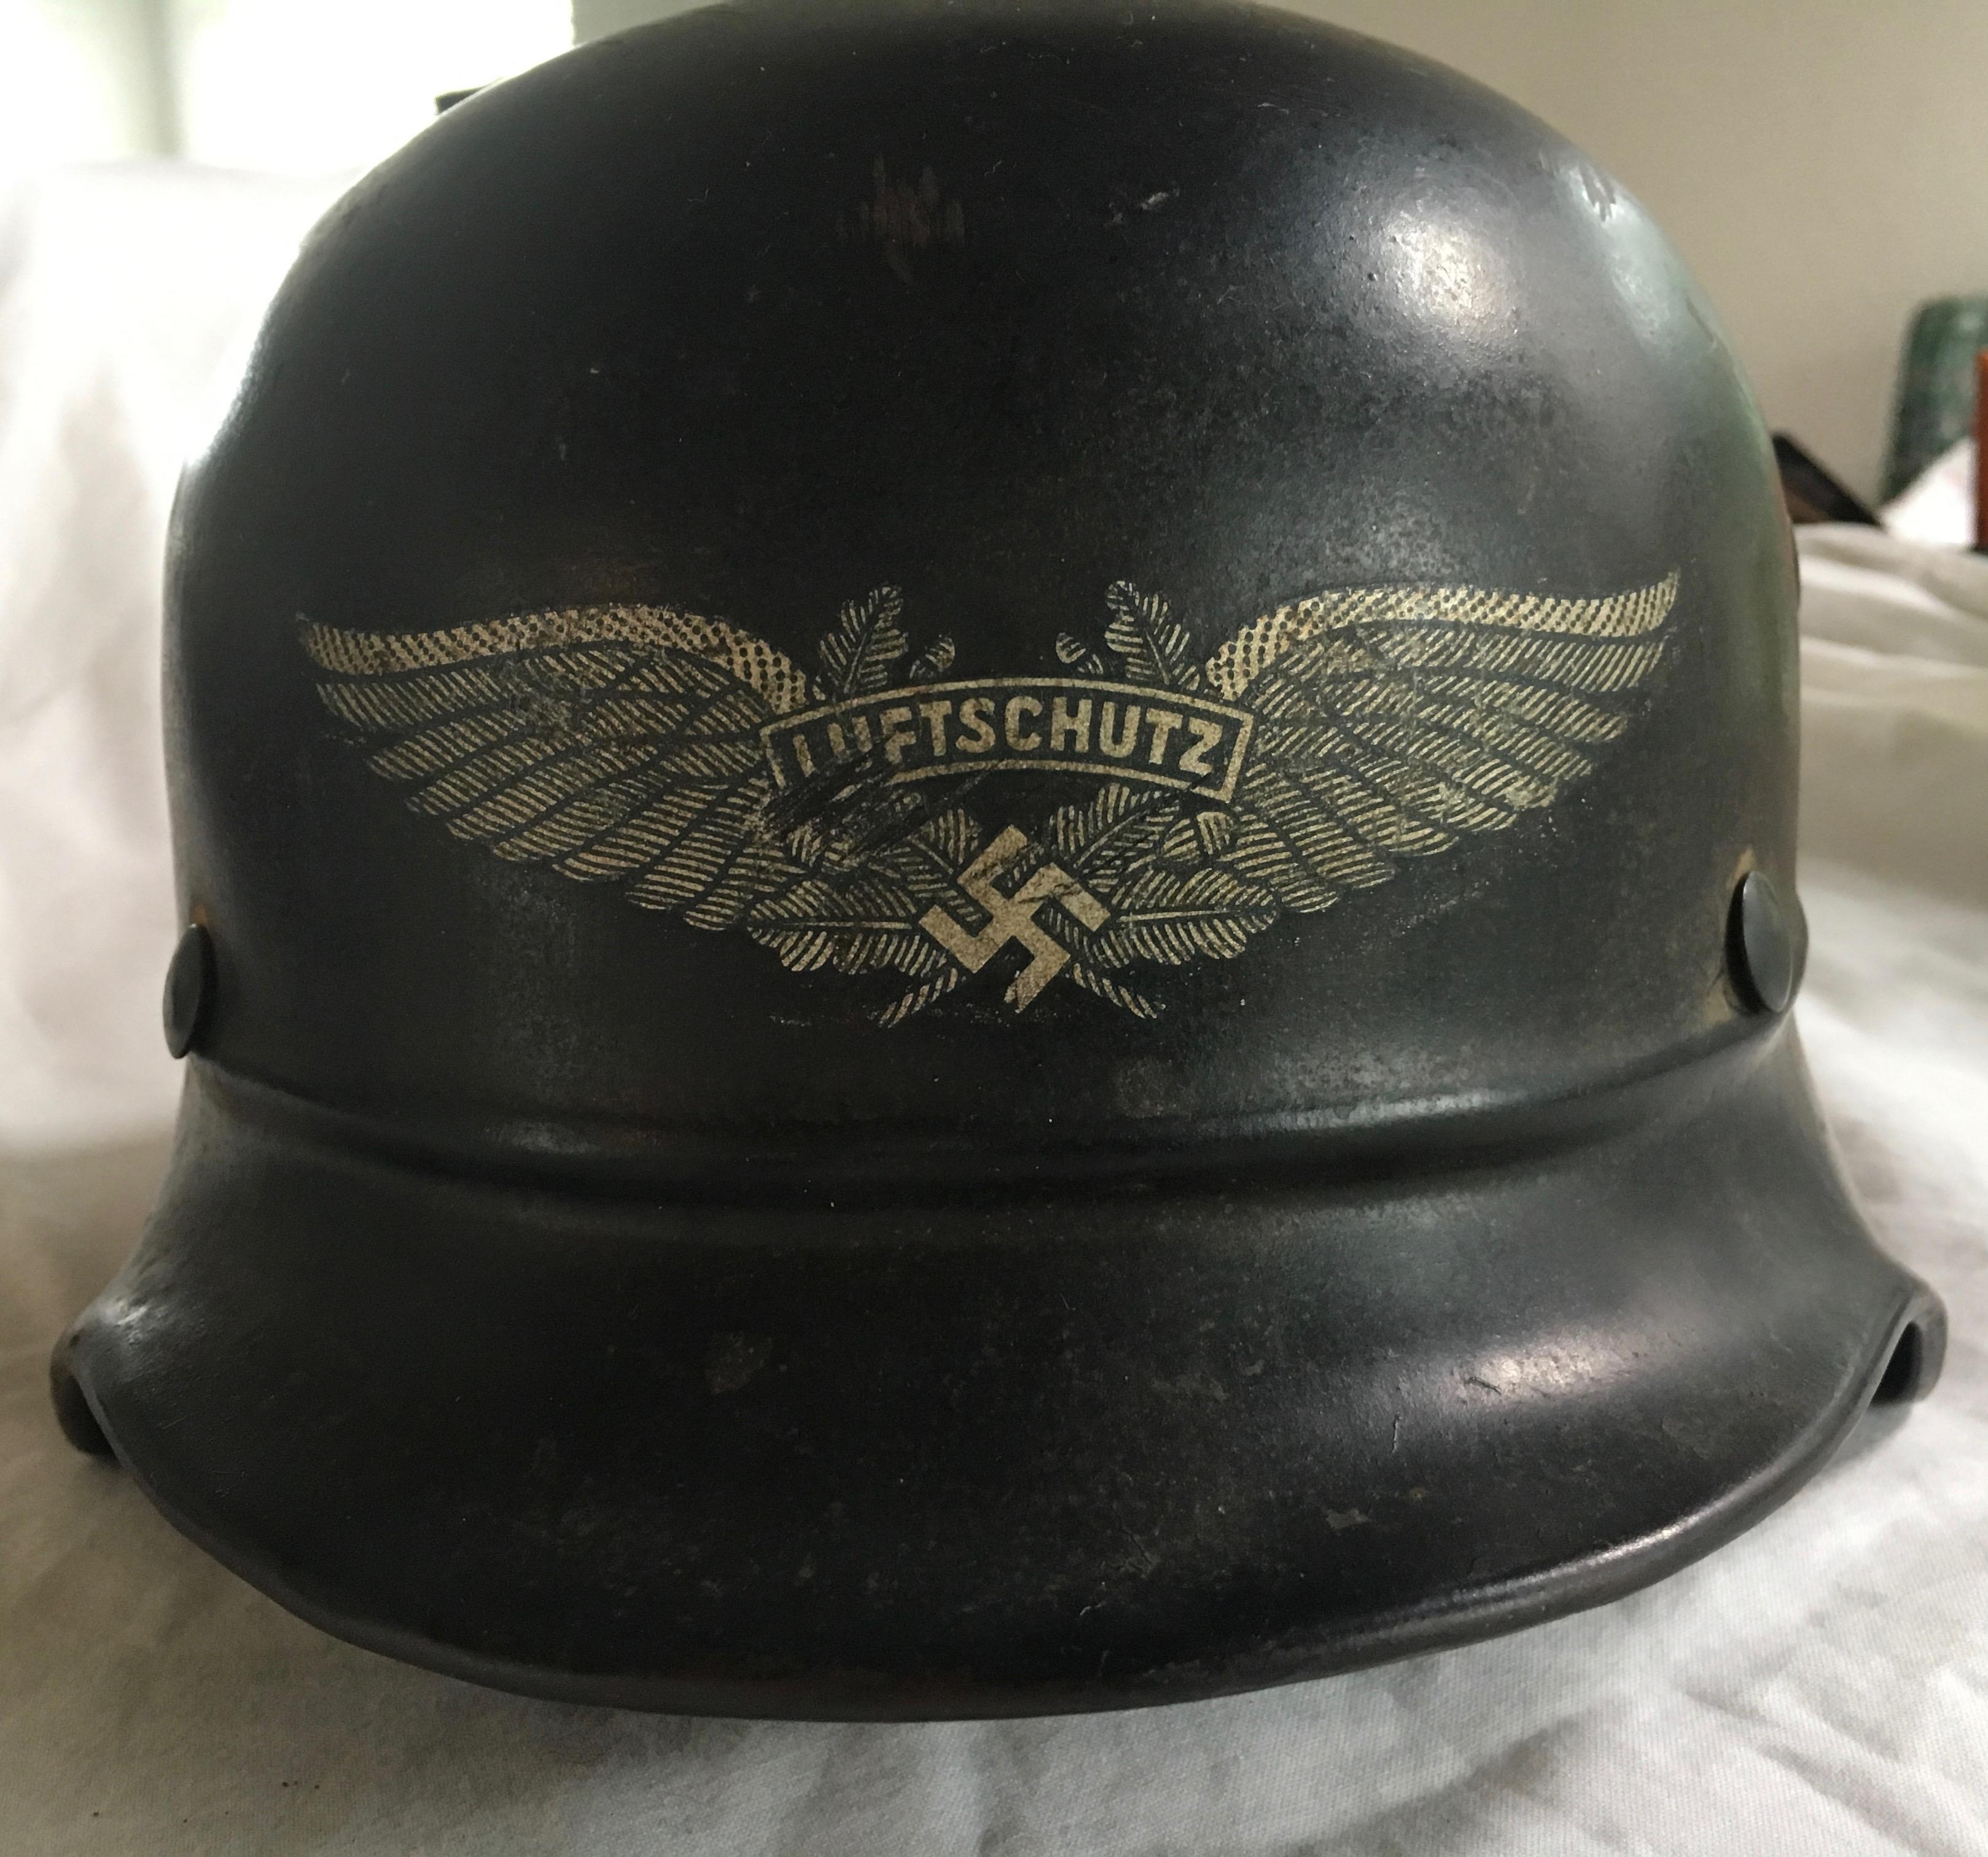 selling a nazi helmet with swastika on it - The eBay Community